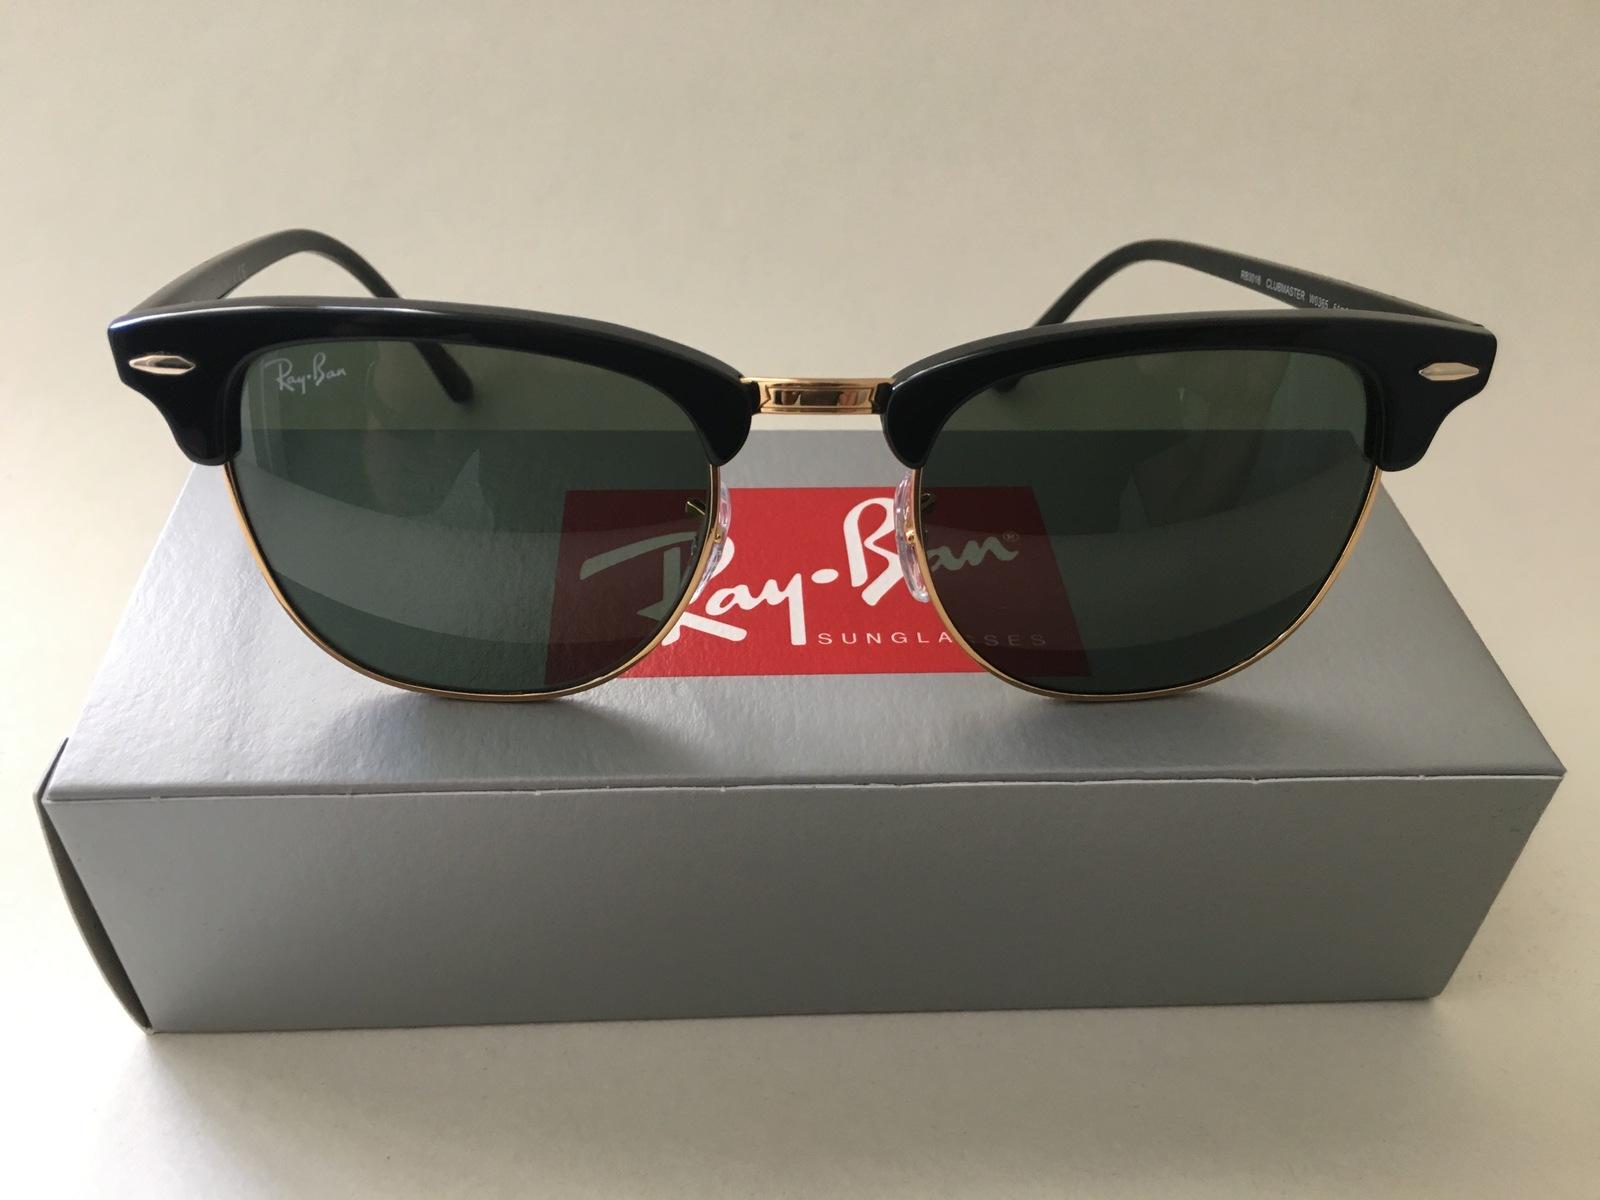 e9d9f0ad29 Rb3016 w0365 1. Rb3016 w0365 1. Previous. Ray-Ban RB3016 W0365 Black   Gold Clubmaster  Sunglasses G15 Green Lens ...